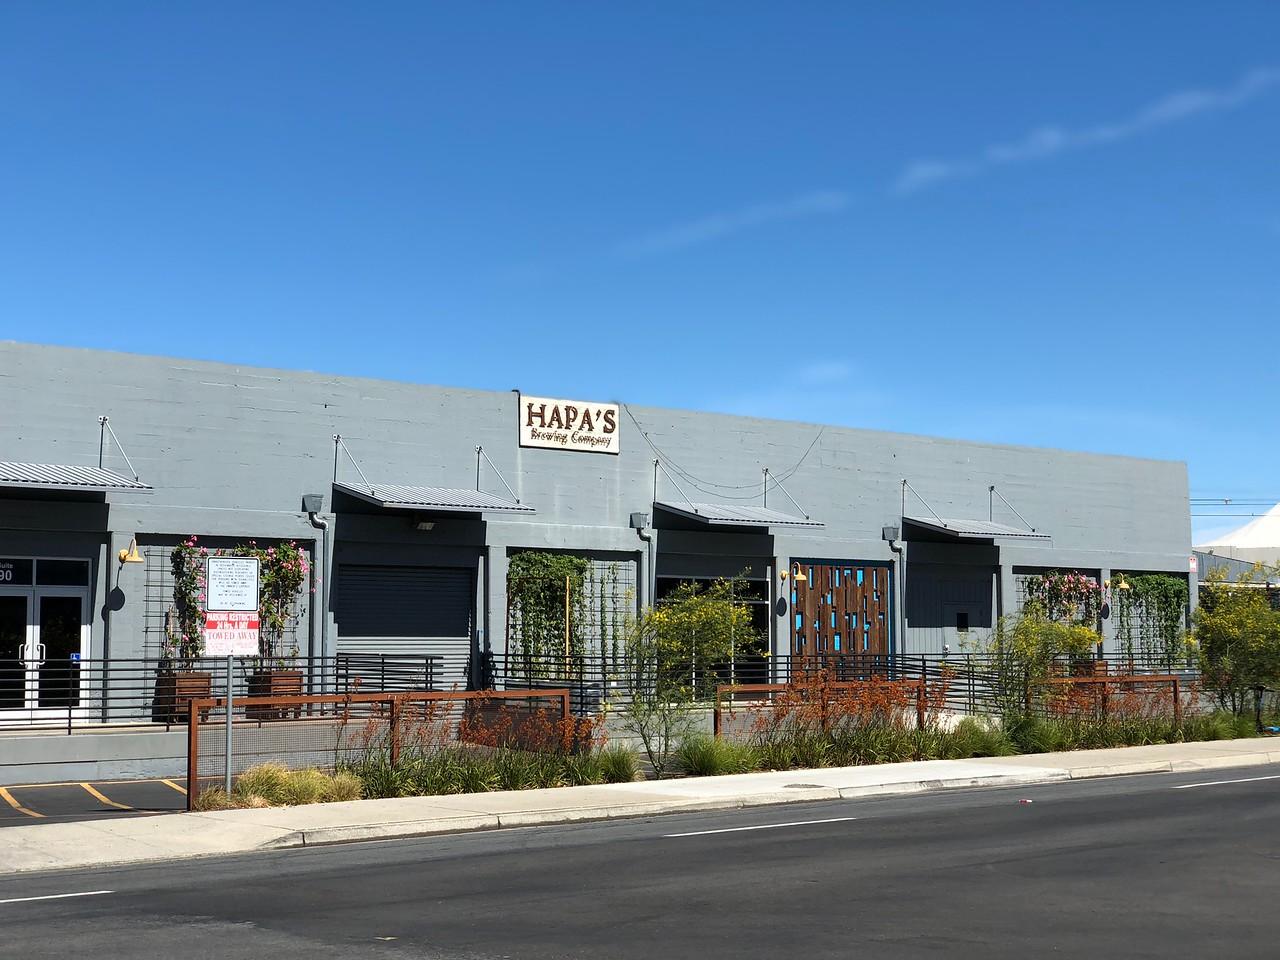 Hapa's+Brewing+Company+Willow+Glen+Blu+Skye+Media-X2.jpg